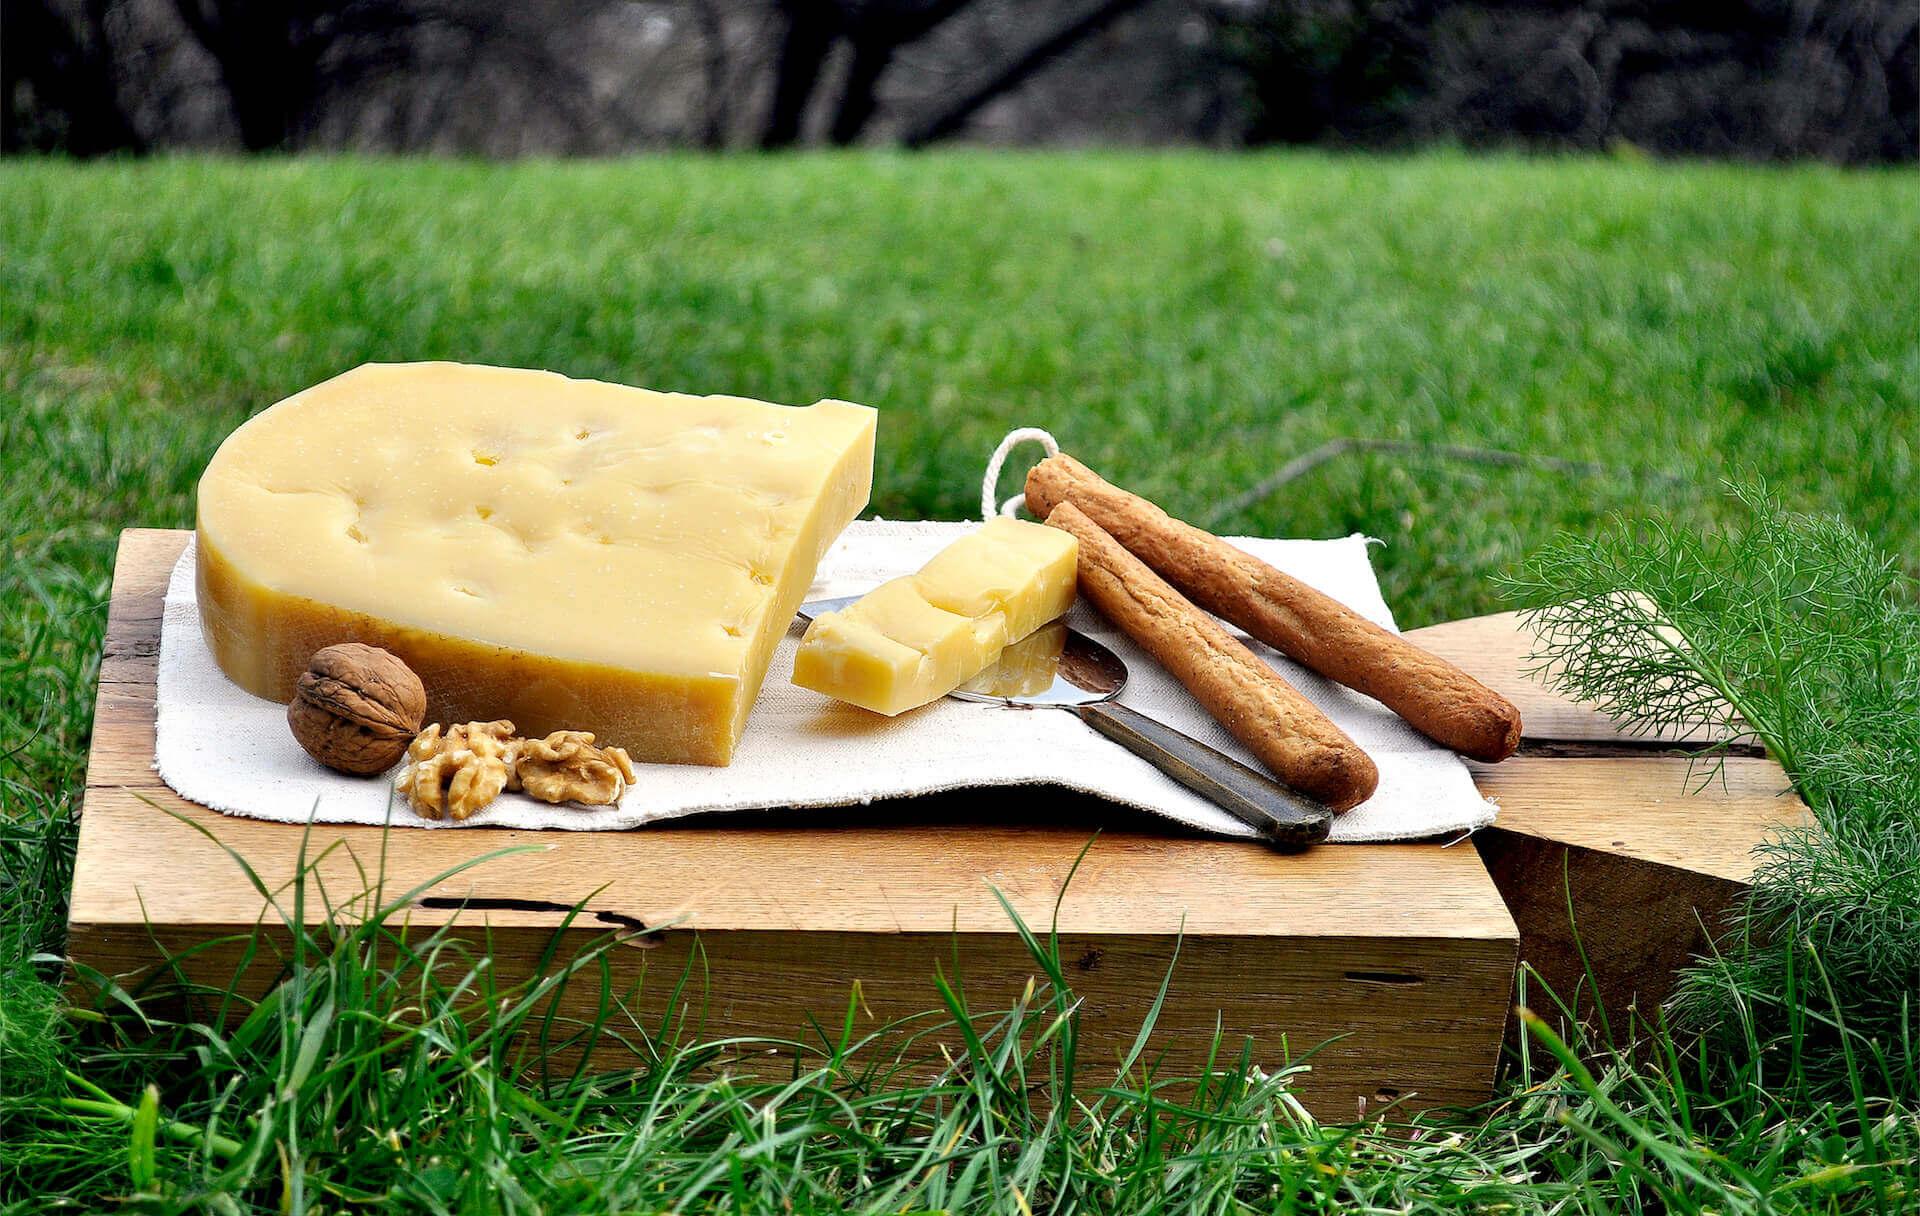 Gruyere Cheese (Gravyer Cheese) from Kars is a world-class cheese.